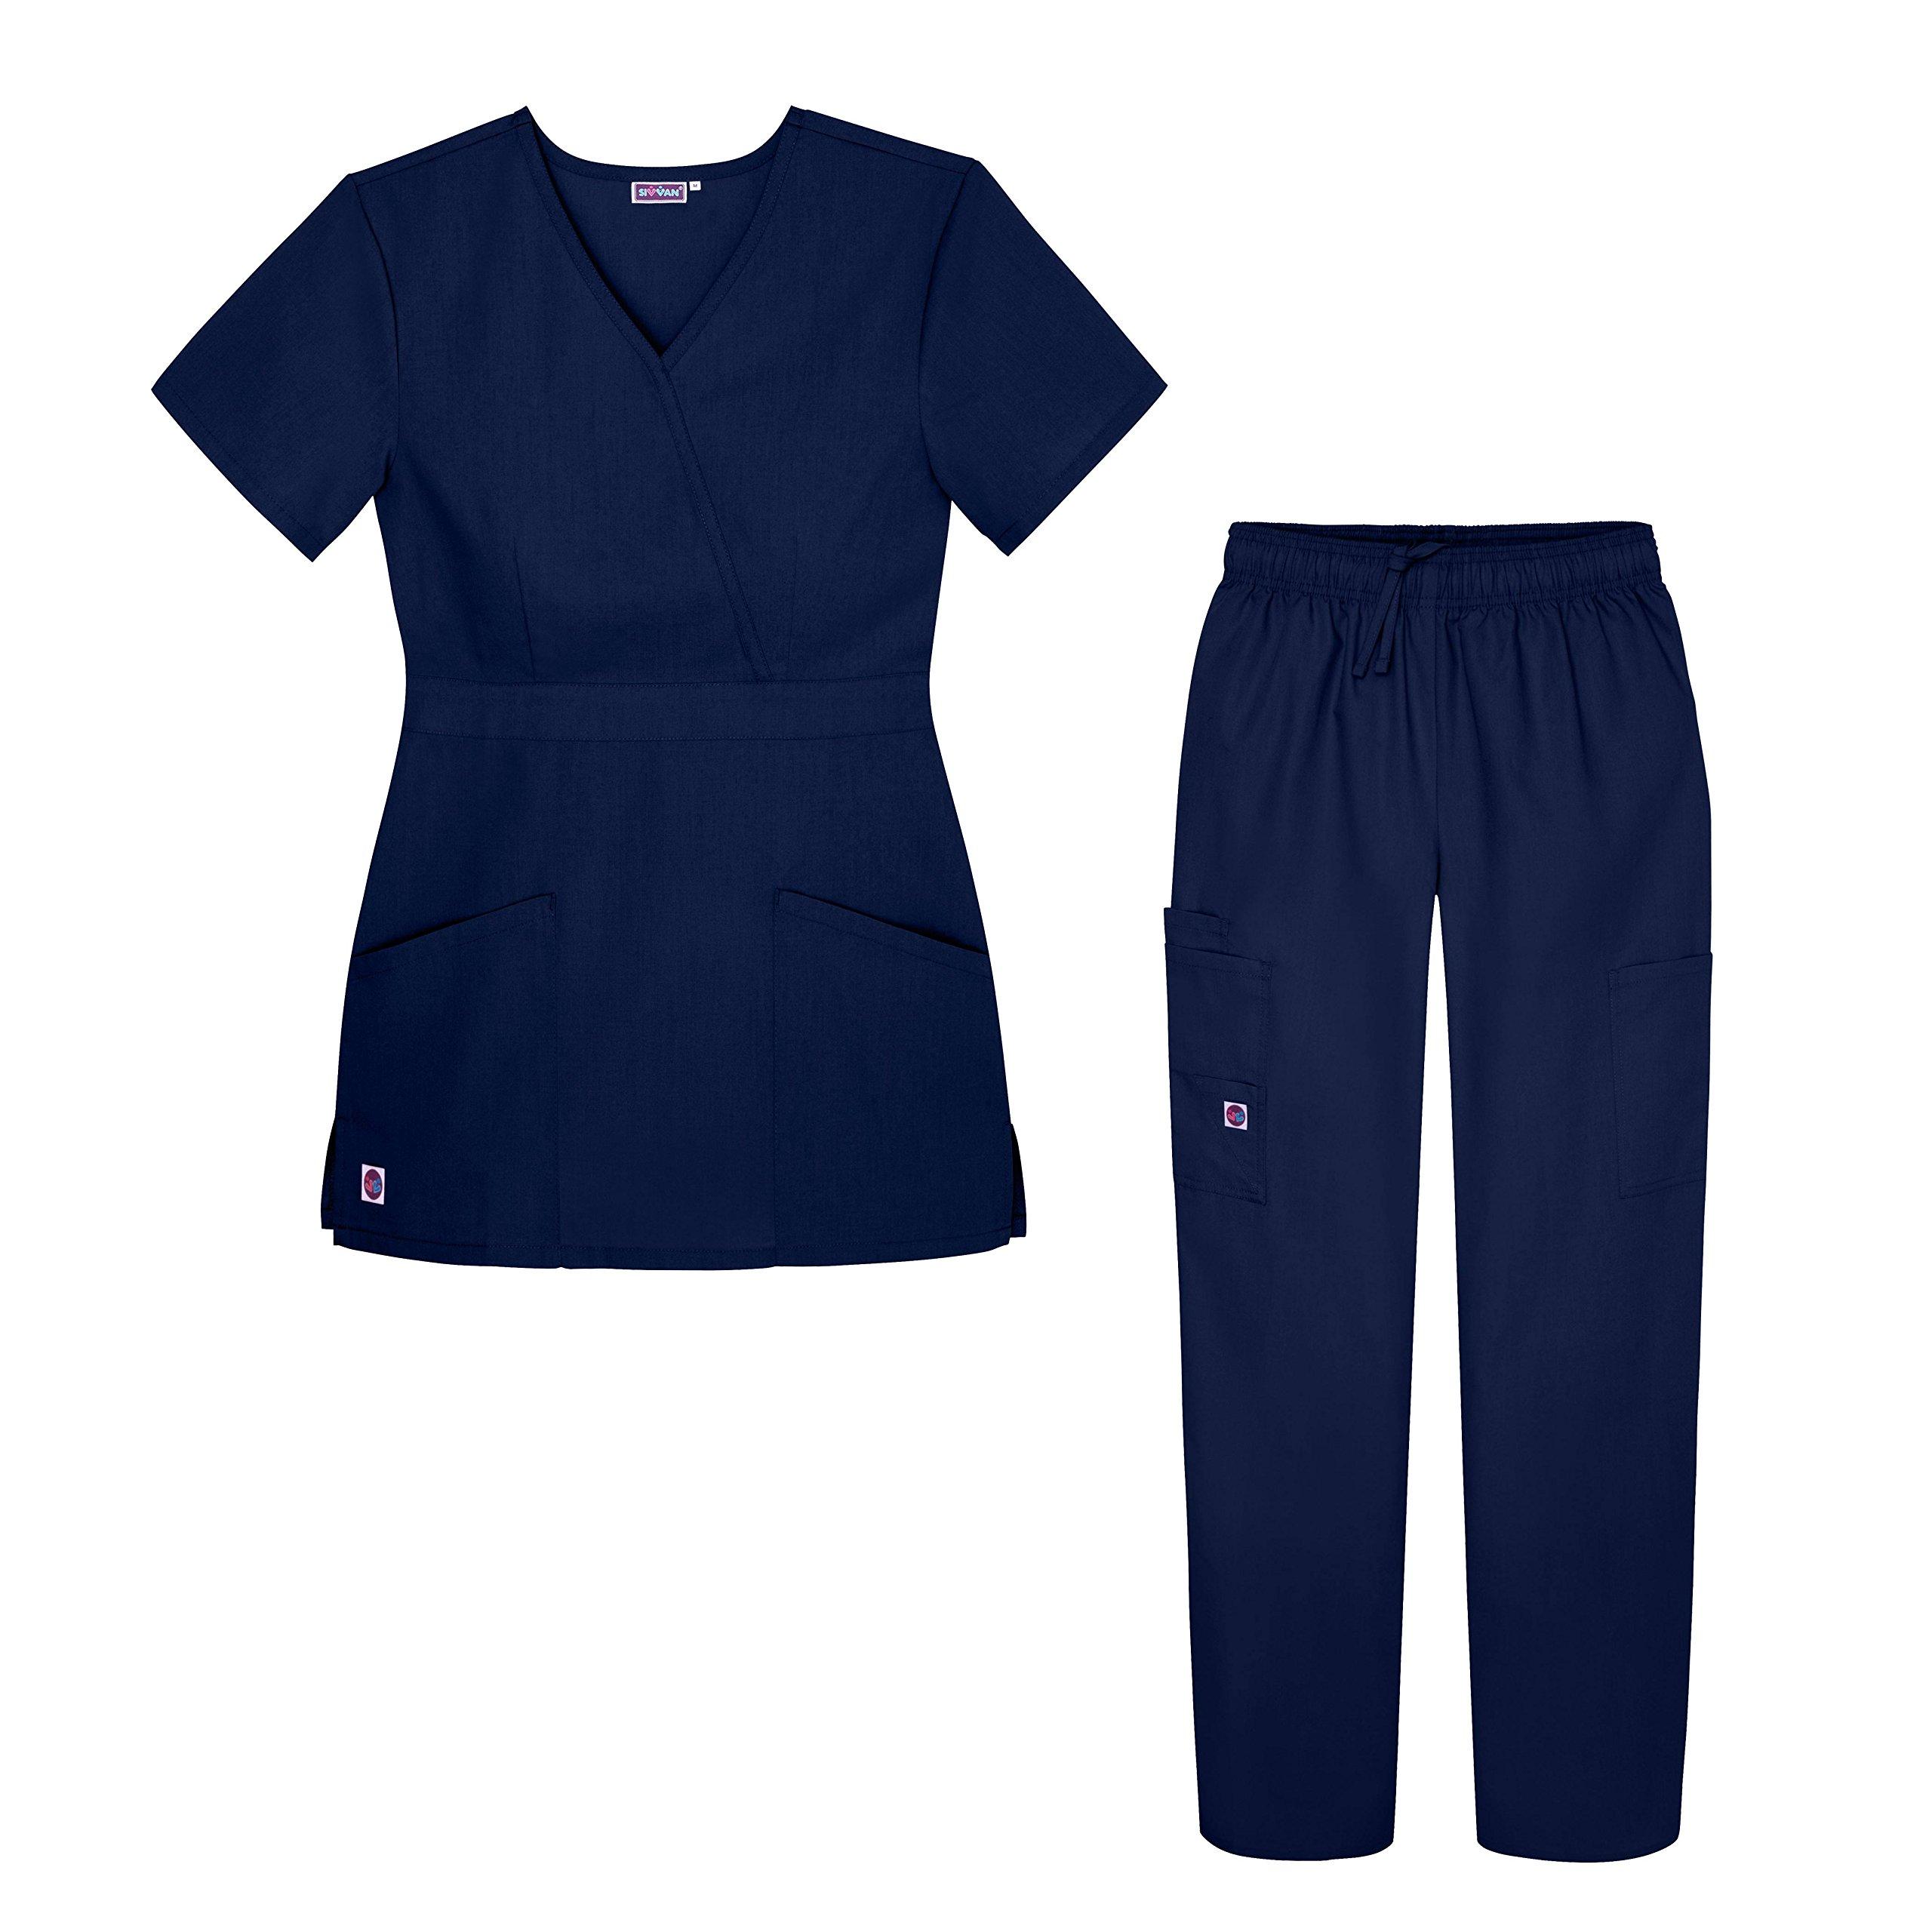 Sivvan Women's Scrub Set - Multi Pocket Cargo Pants & Stylish Mock Wrap Top - S8401 - Nvy - XS